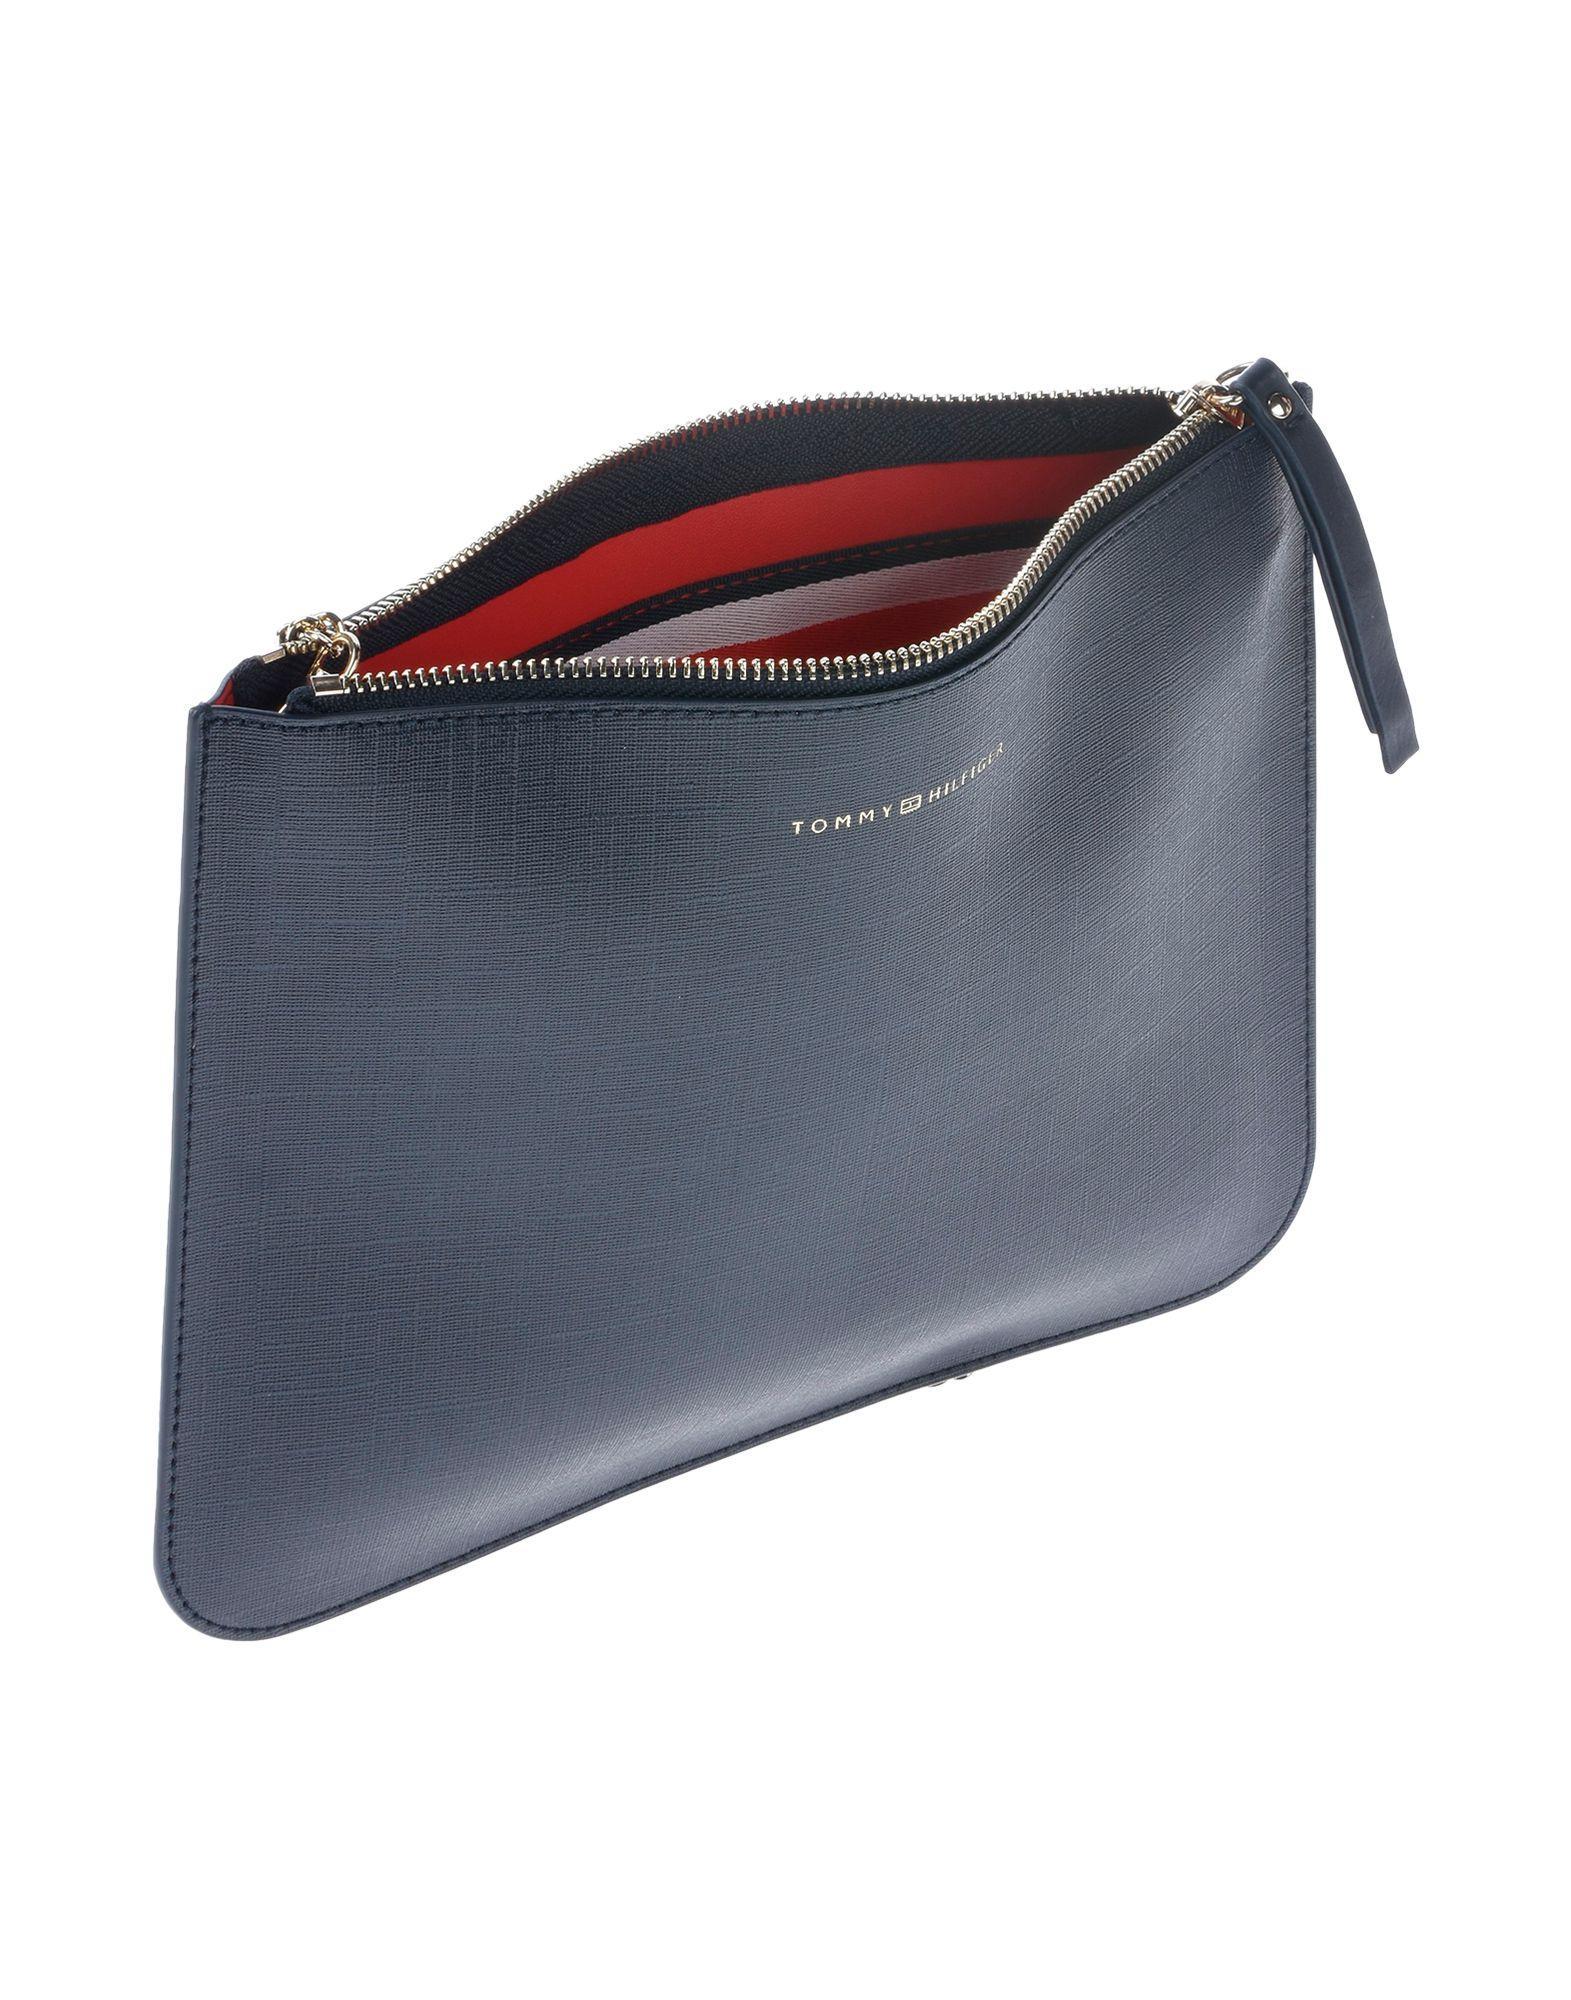 df2d053baa2 Lyst - Tommy Hilfiger Handbag in Blue